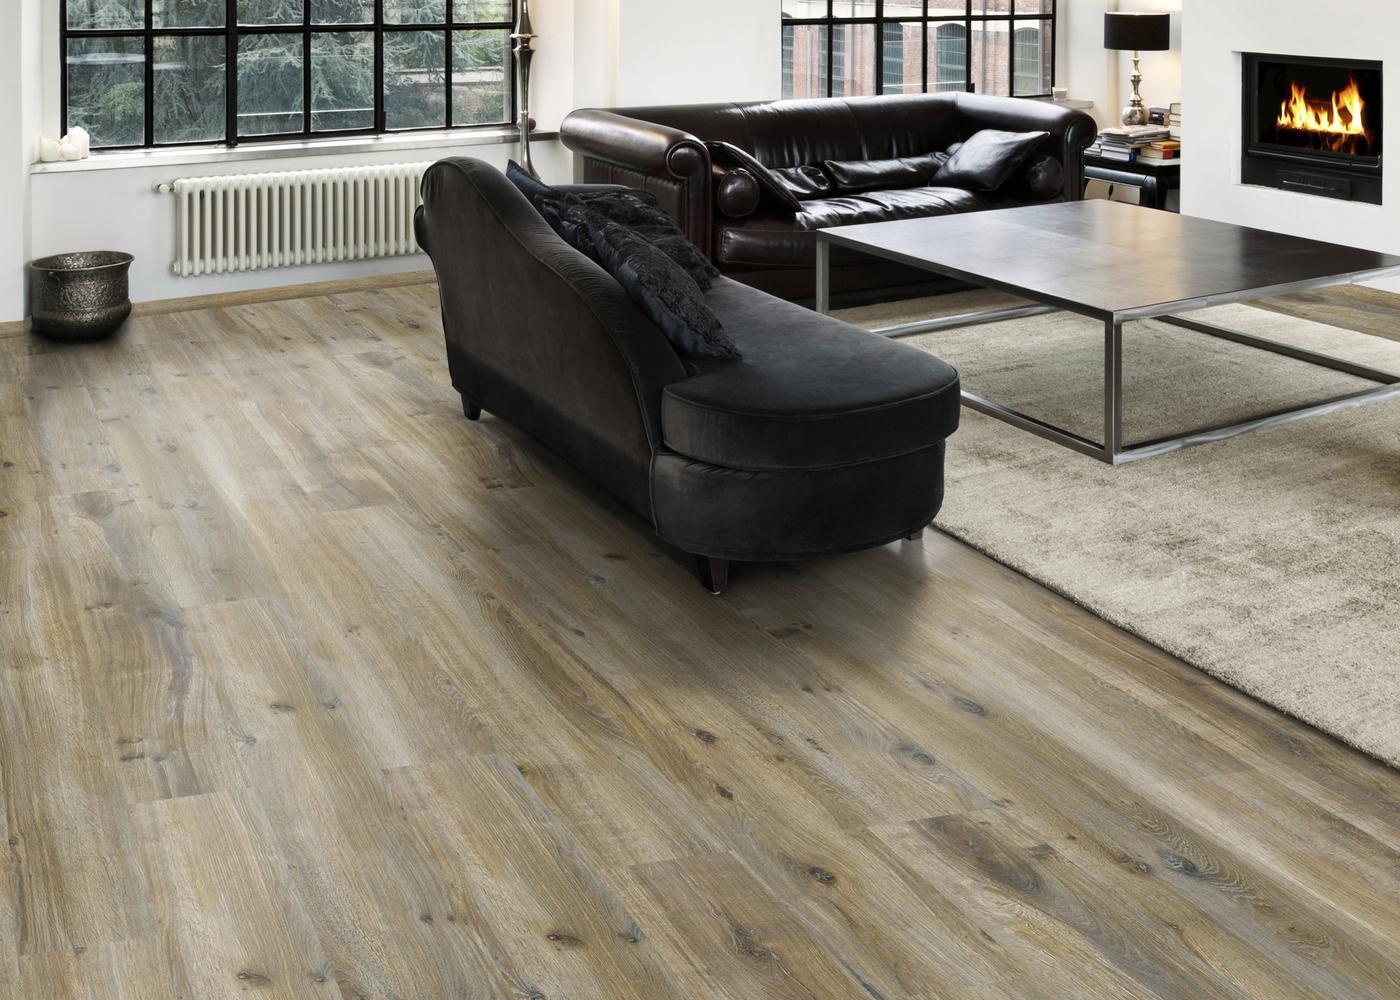 entretien sol stratifi good entretien parquet stratifie plancher sapin parquet frane entretien. Black Bedroom Furniture Sets. Home Design Ideas